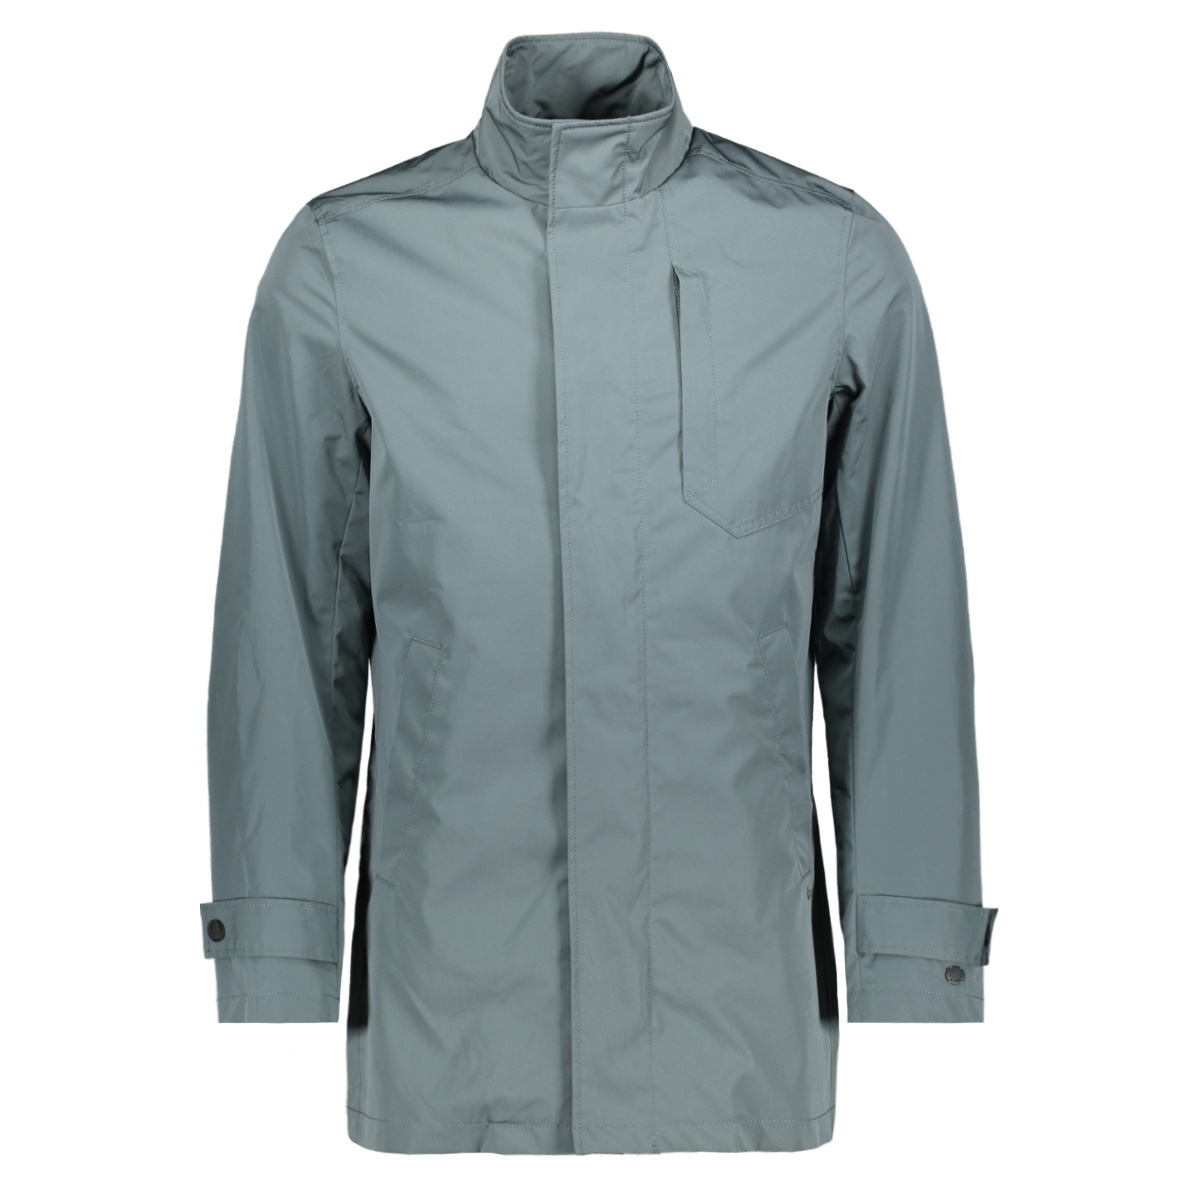 rain car coat cja191504 cast iron jas 5229